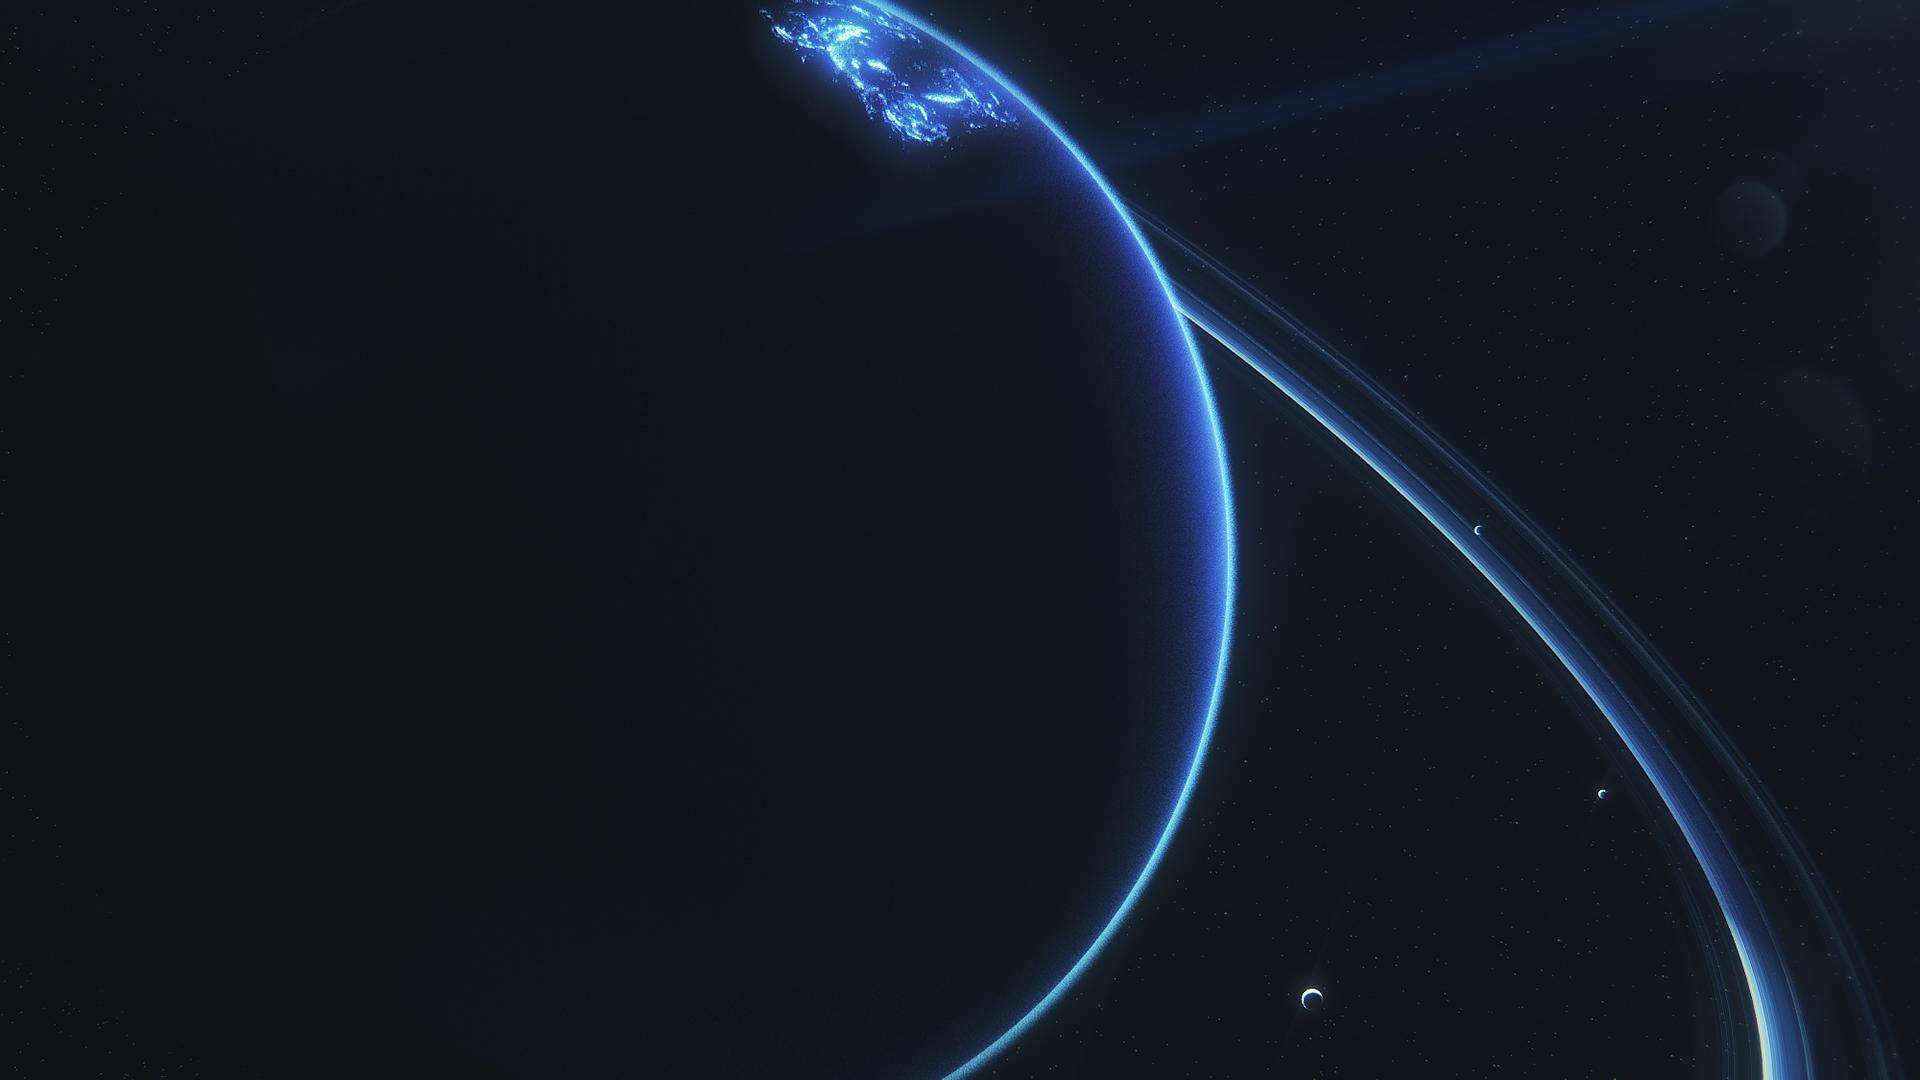 Wallpaper Space Sky Uranus Planet 1920x1080 Ageme 1286999